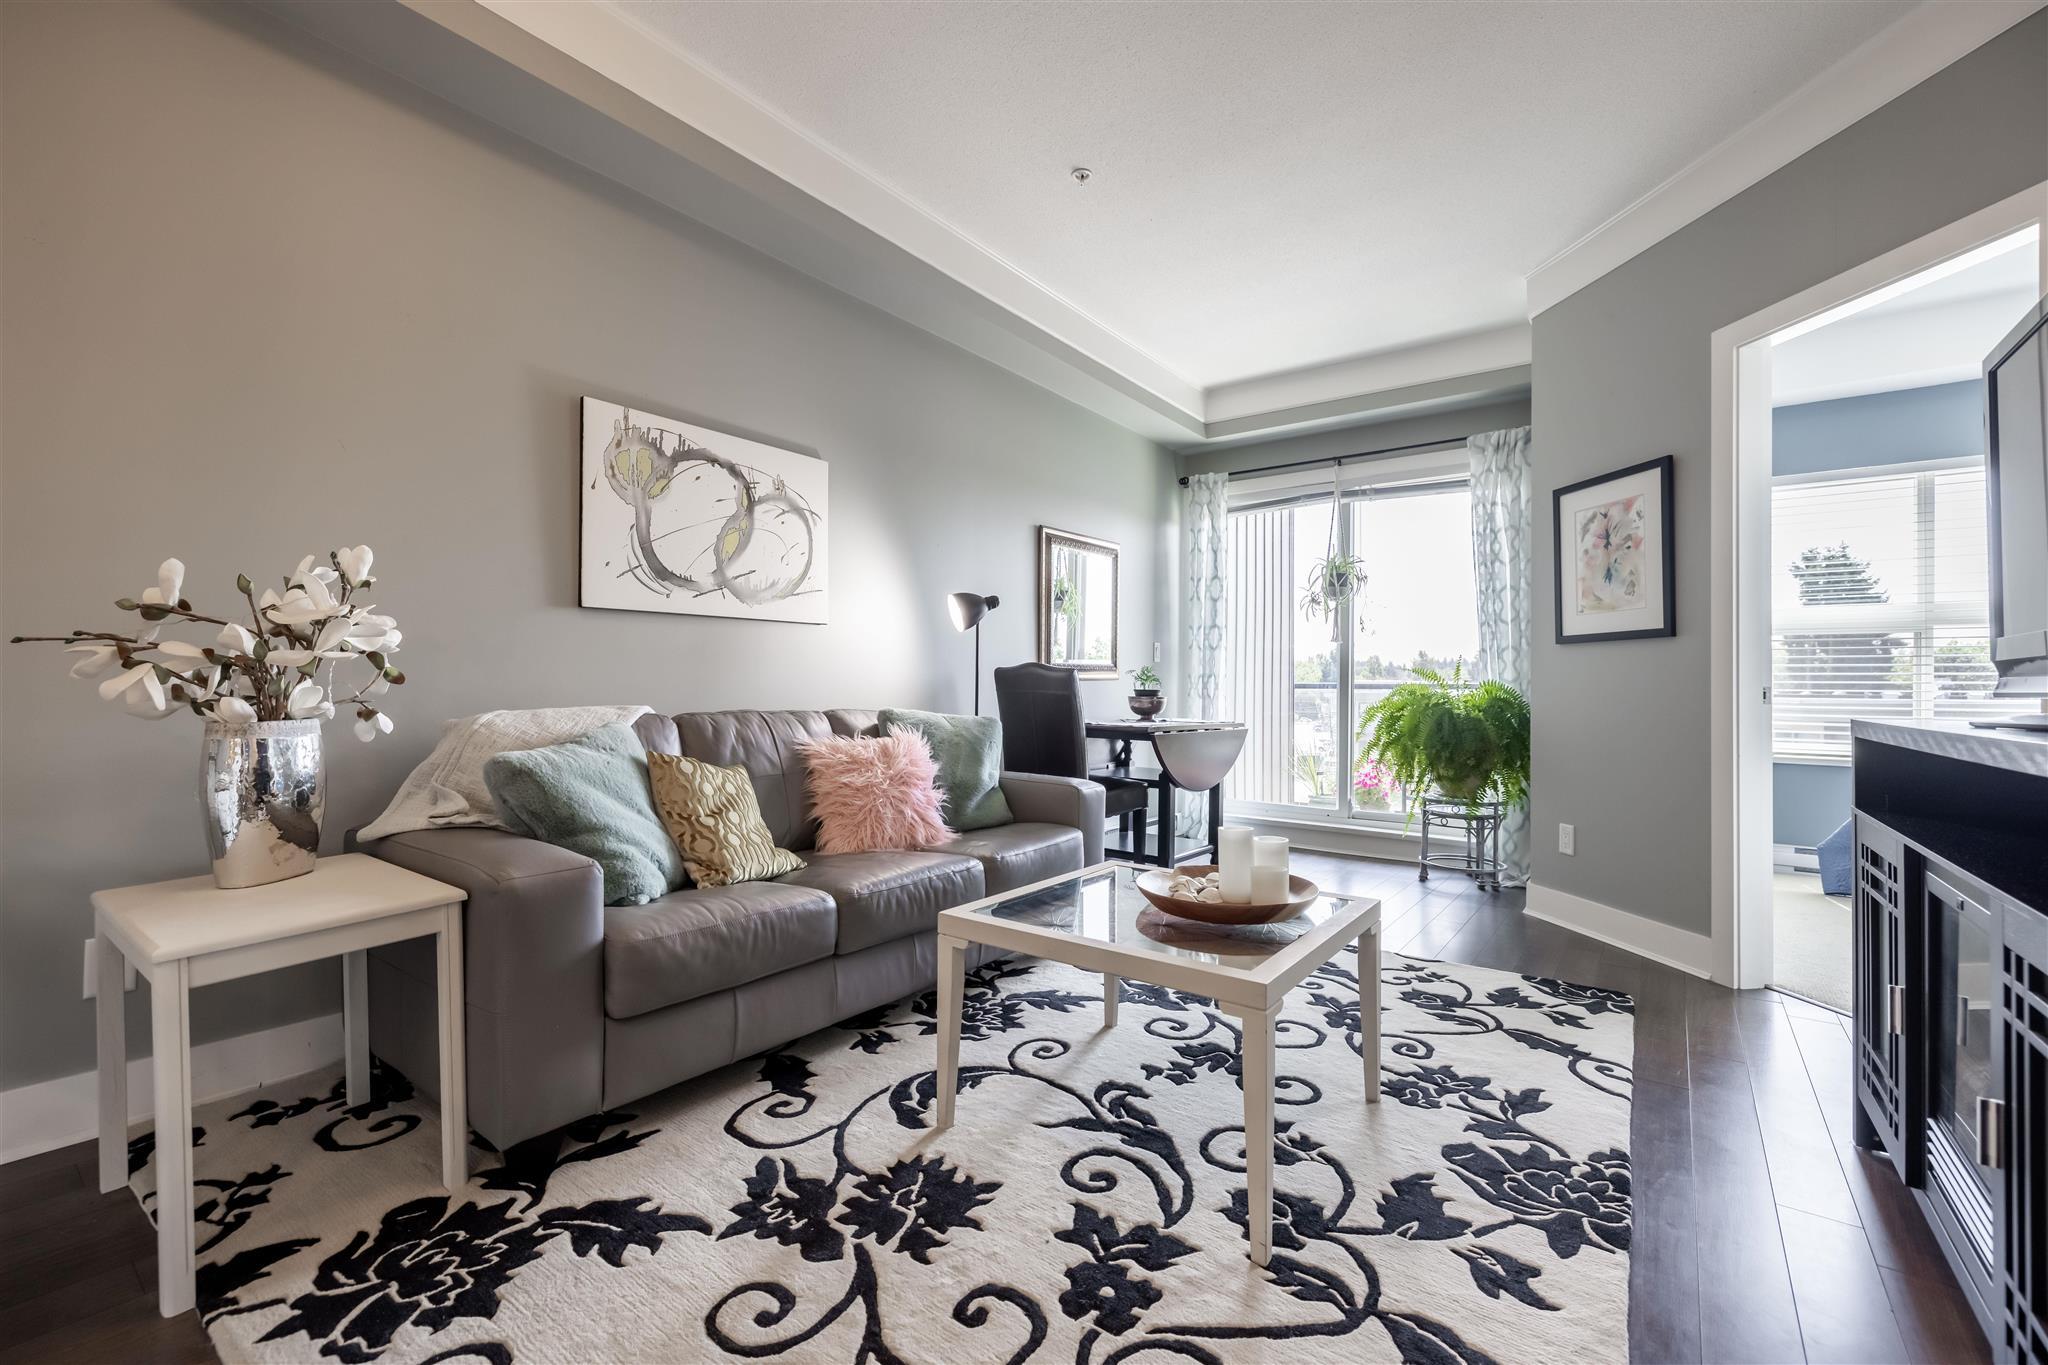 306 20630 DOUGLAS CRESCENT - Langley City Apartment/Condo for sale, 2 Bedrooms (R2605072) - #1